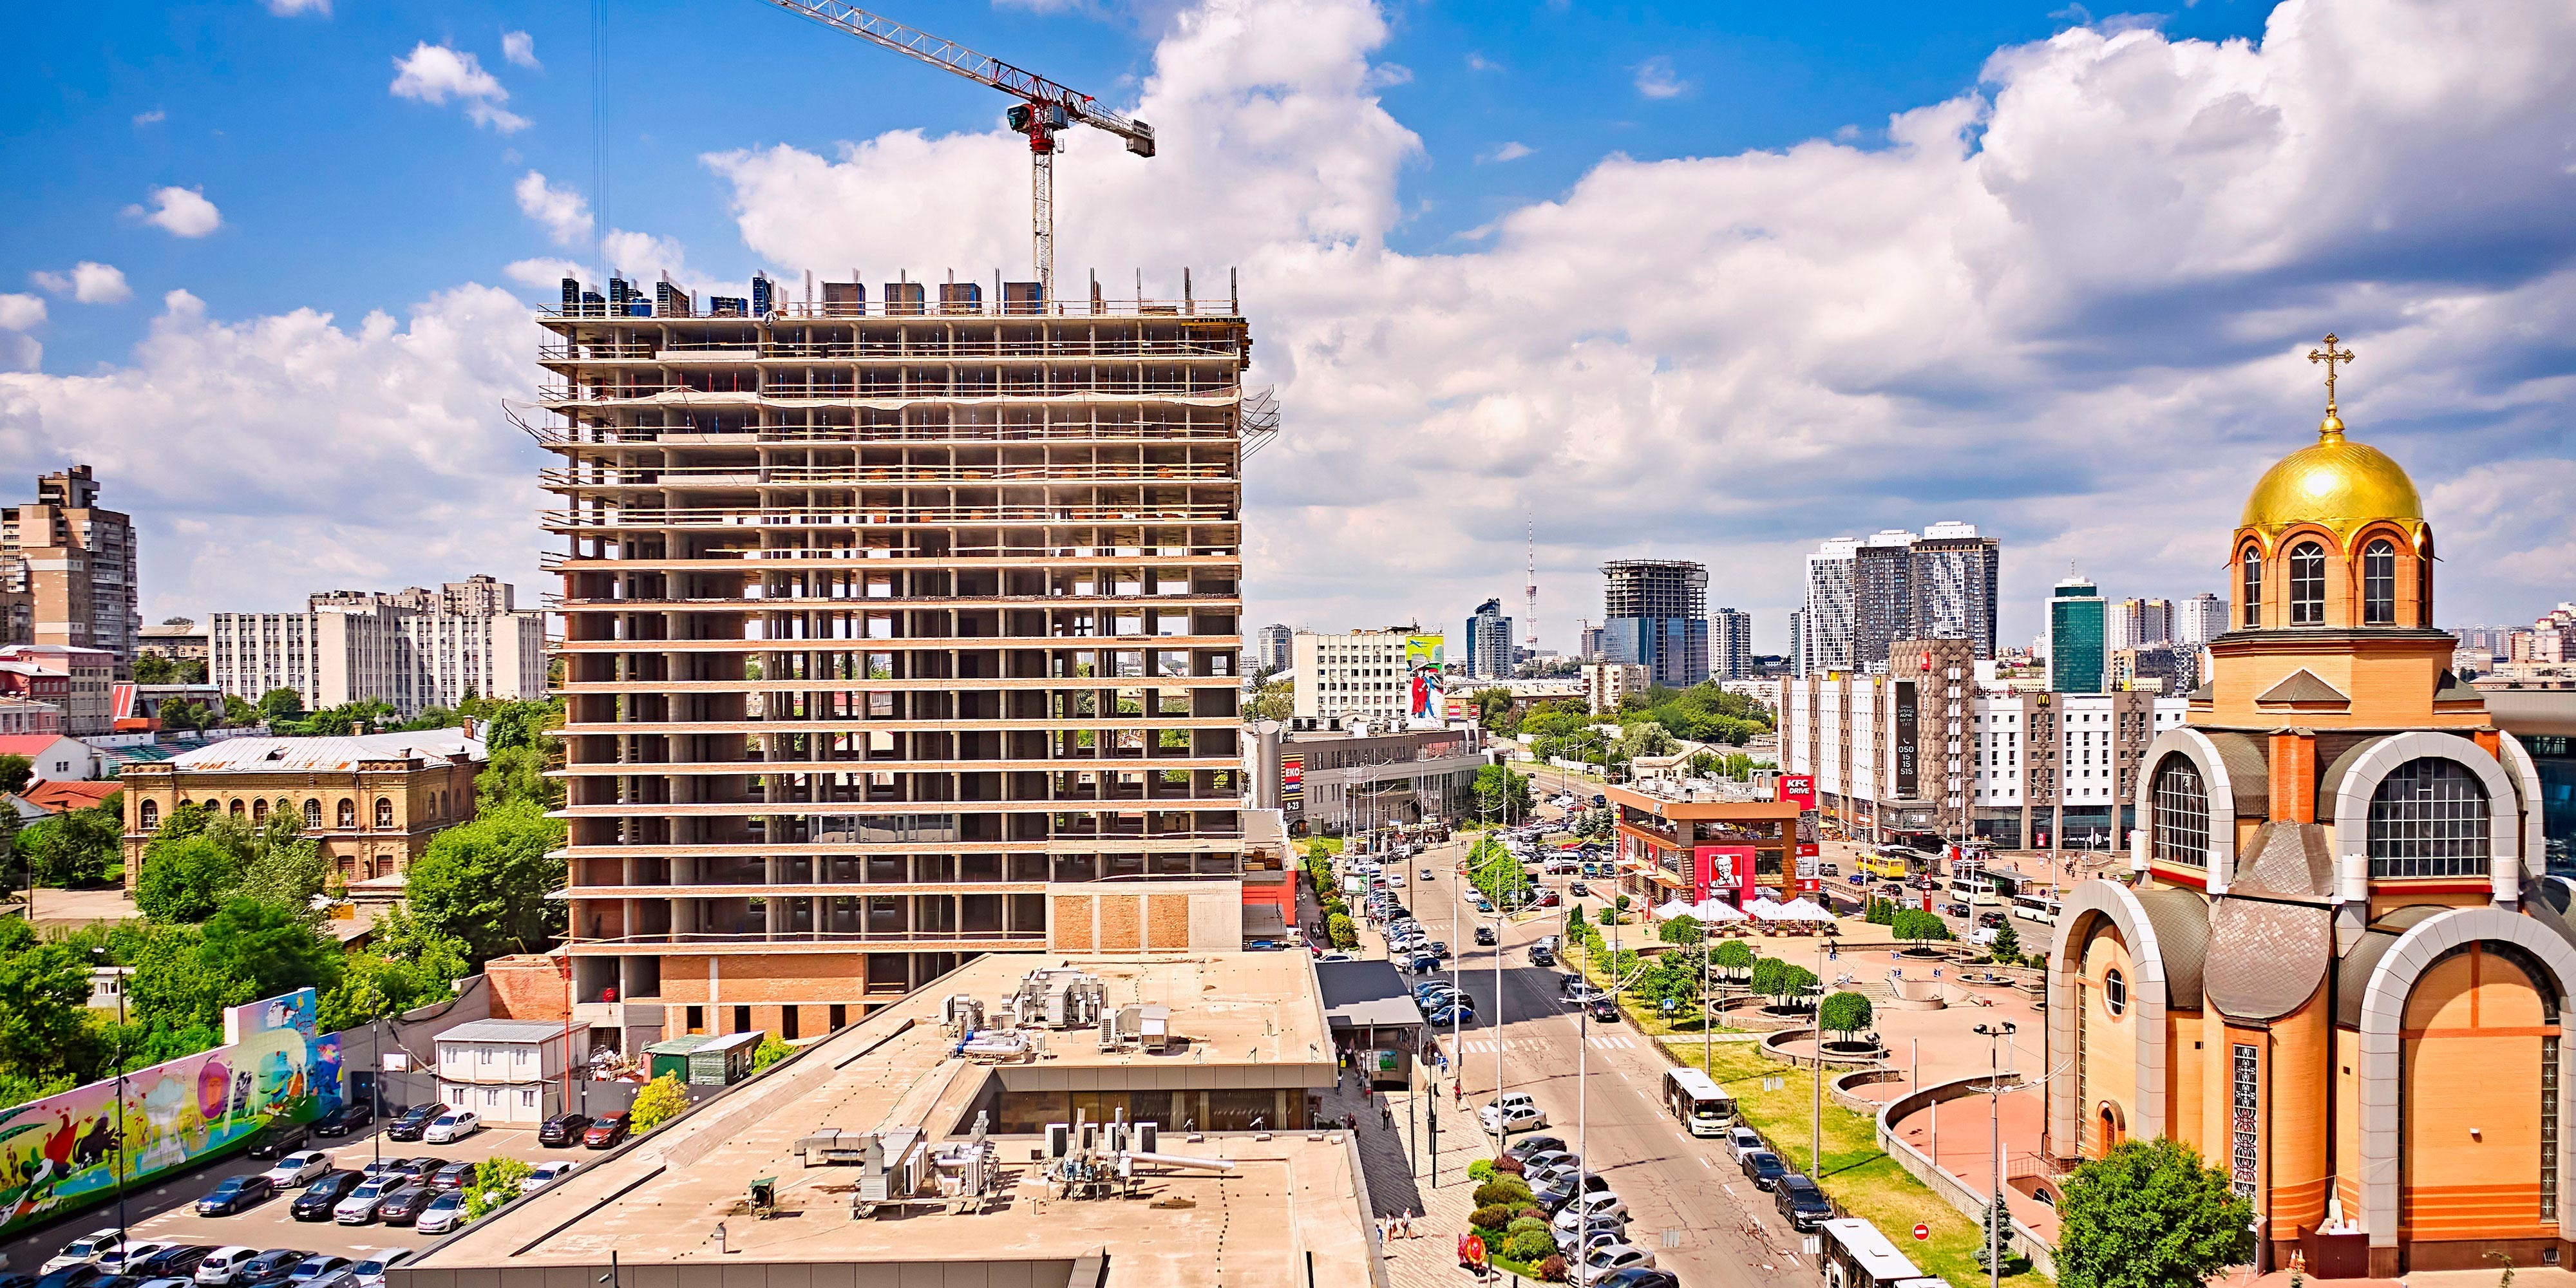 CONSTRUCTION PROGRESS OF S1 TERMINAL. JULY 2021